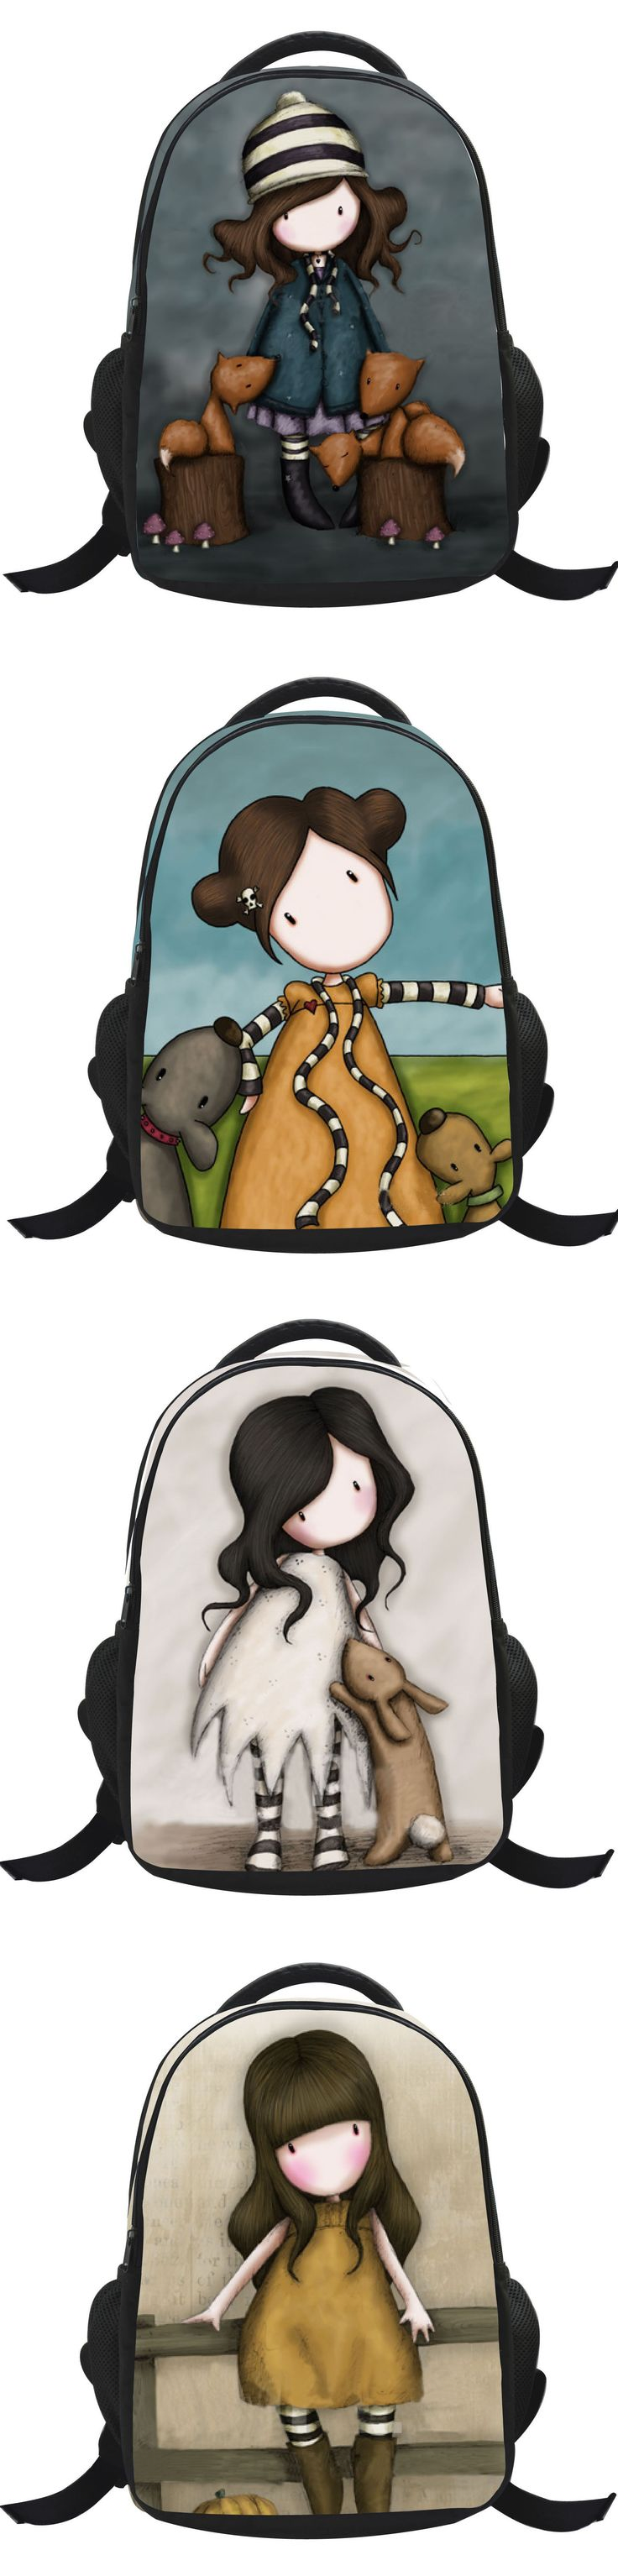 Animated cartoon kids school bags for girls,Shoulder bag randoseru-Cartoon girl